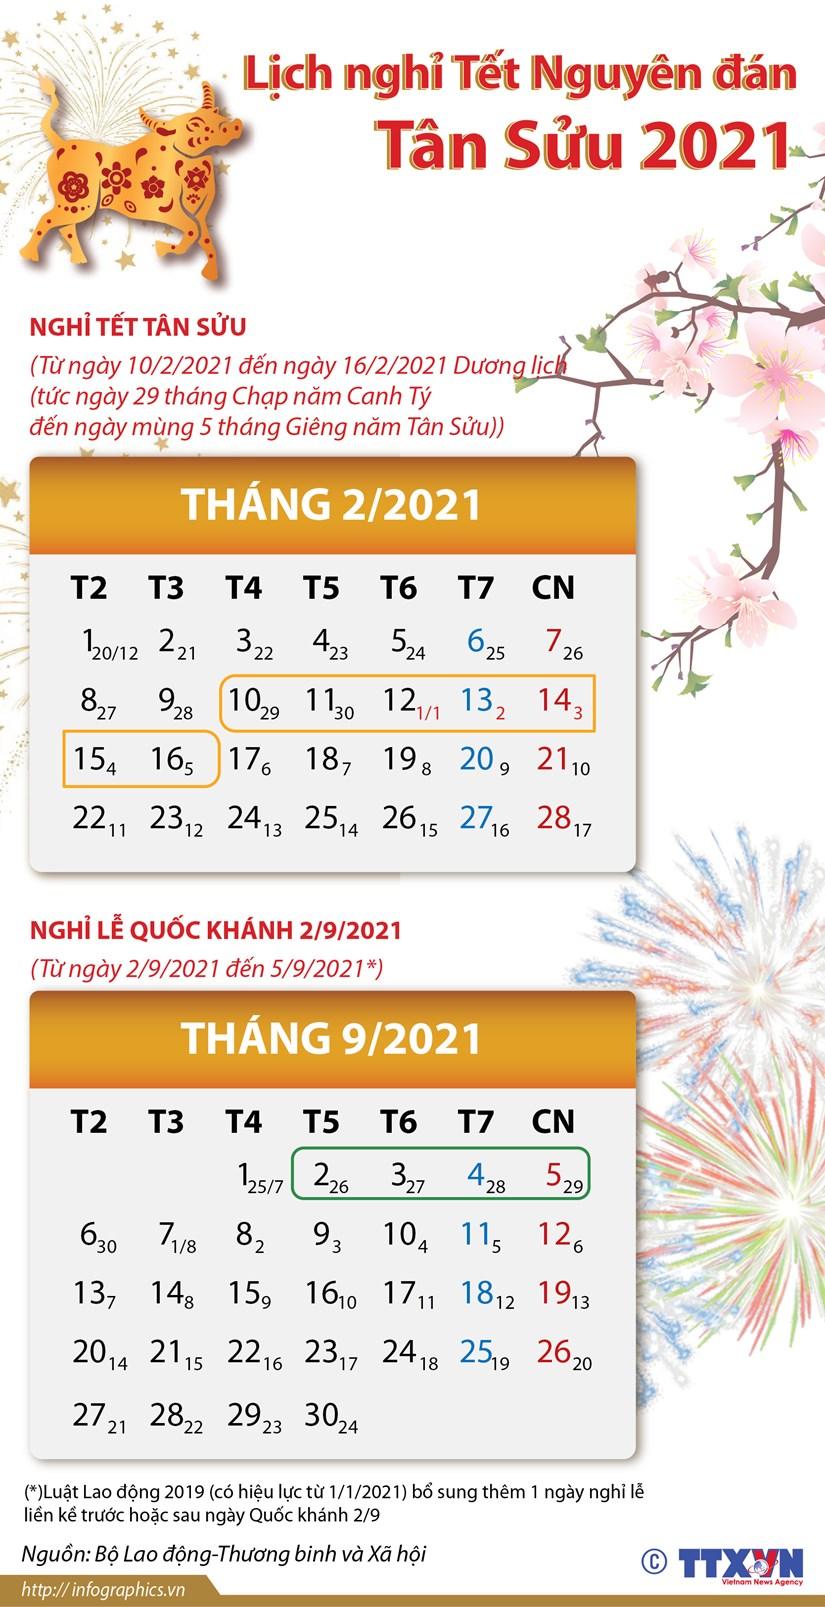 [Infographics] Lich nghi Tet Nguyen dan Tan Suu 2021 hinh anh 1